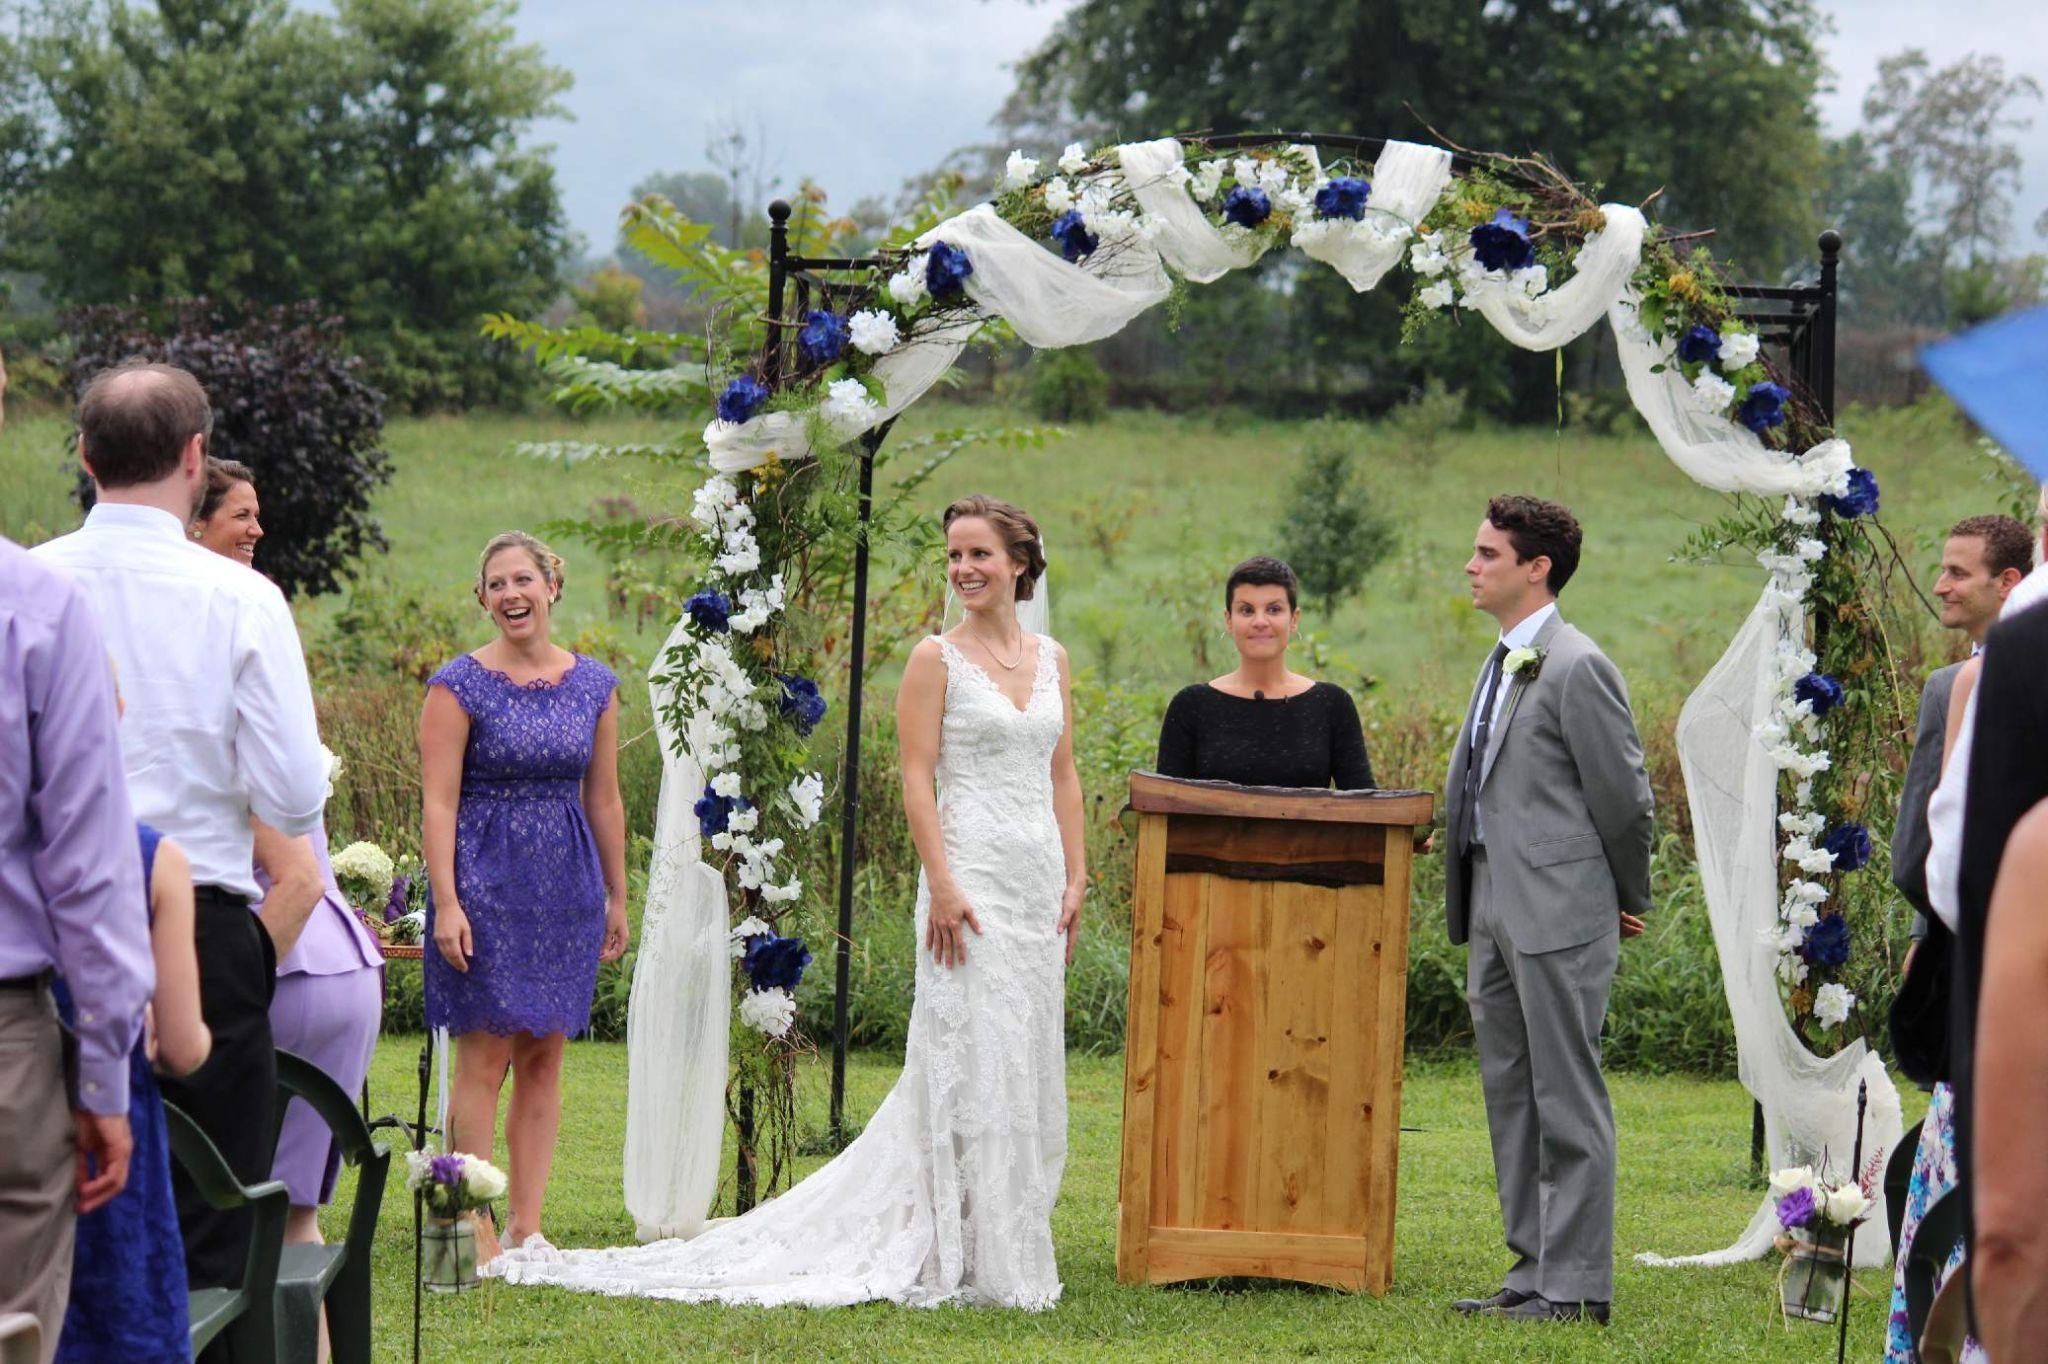 Sarah John S Gorgeous Arbor Decor With Walnut Podium Khimaira Farm Outdoor Barn Wedding Venuebarn Weddingswedding 2017shenandoah Valley Blue